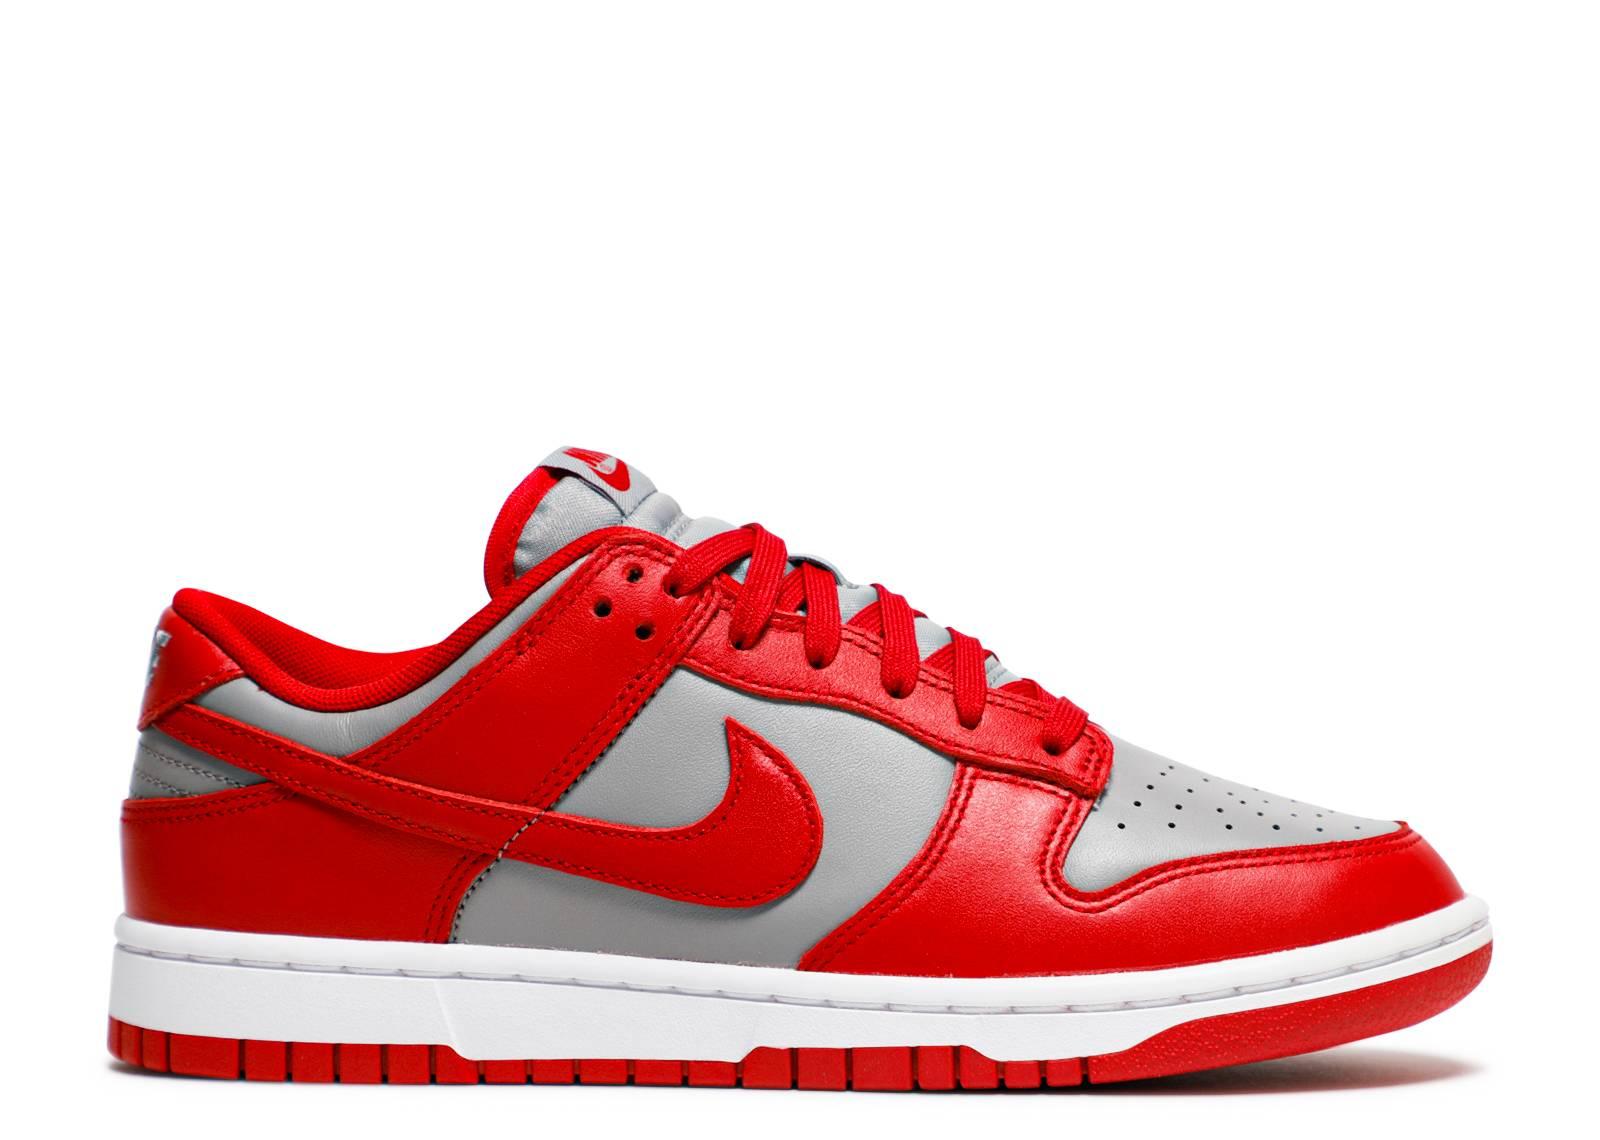 Nike Dunk Sneakers | Flight Club